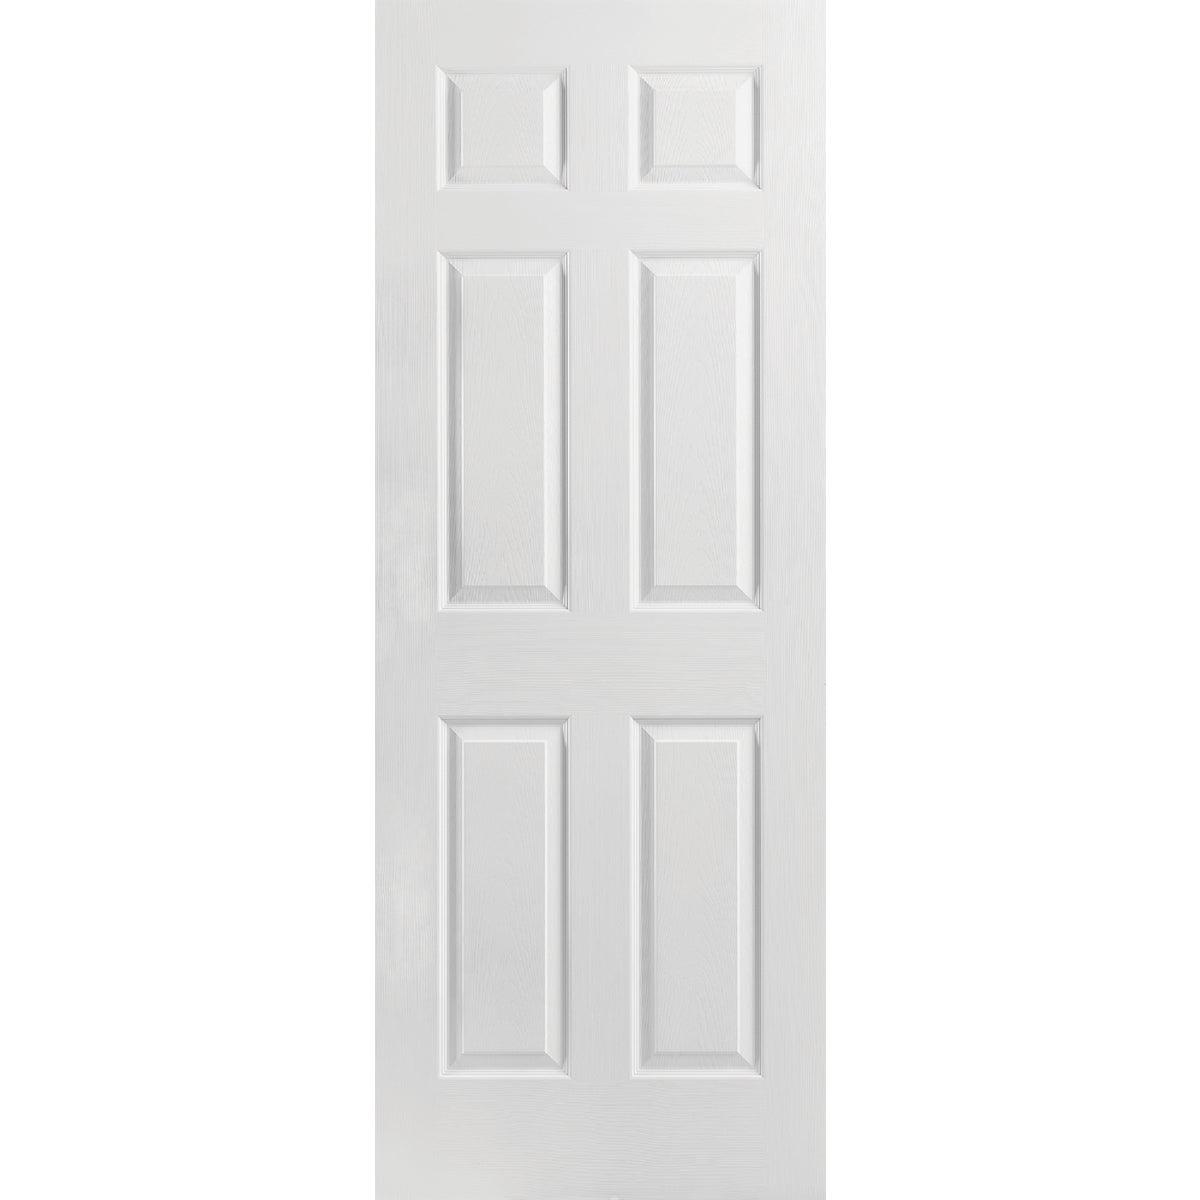 Masonite 2/0 1-3/8 6PN TX HC DOOR